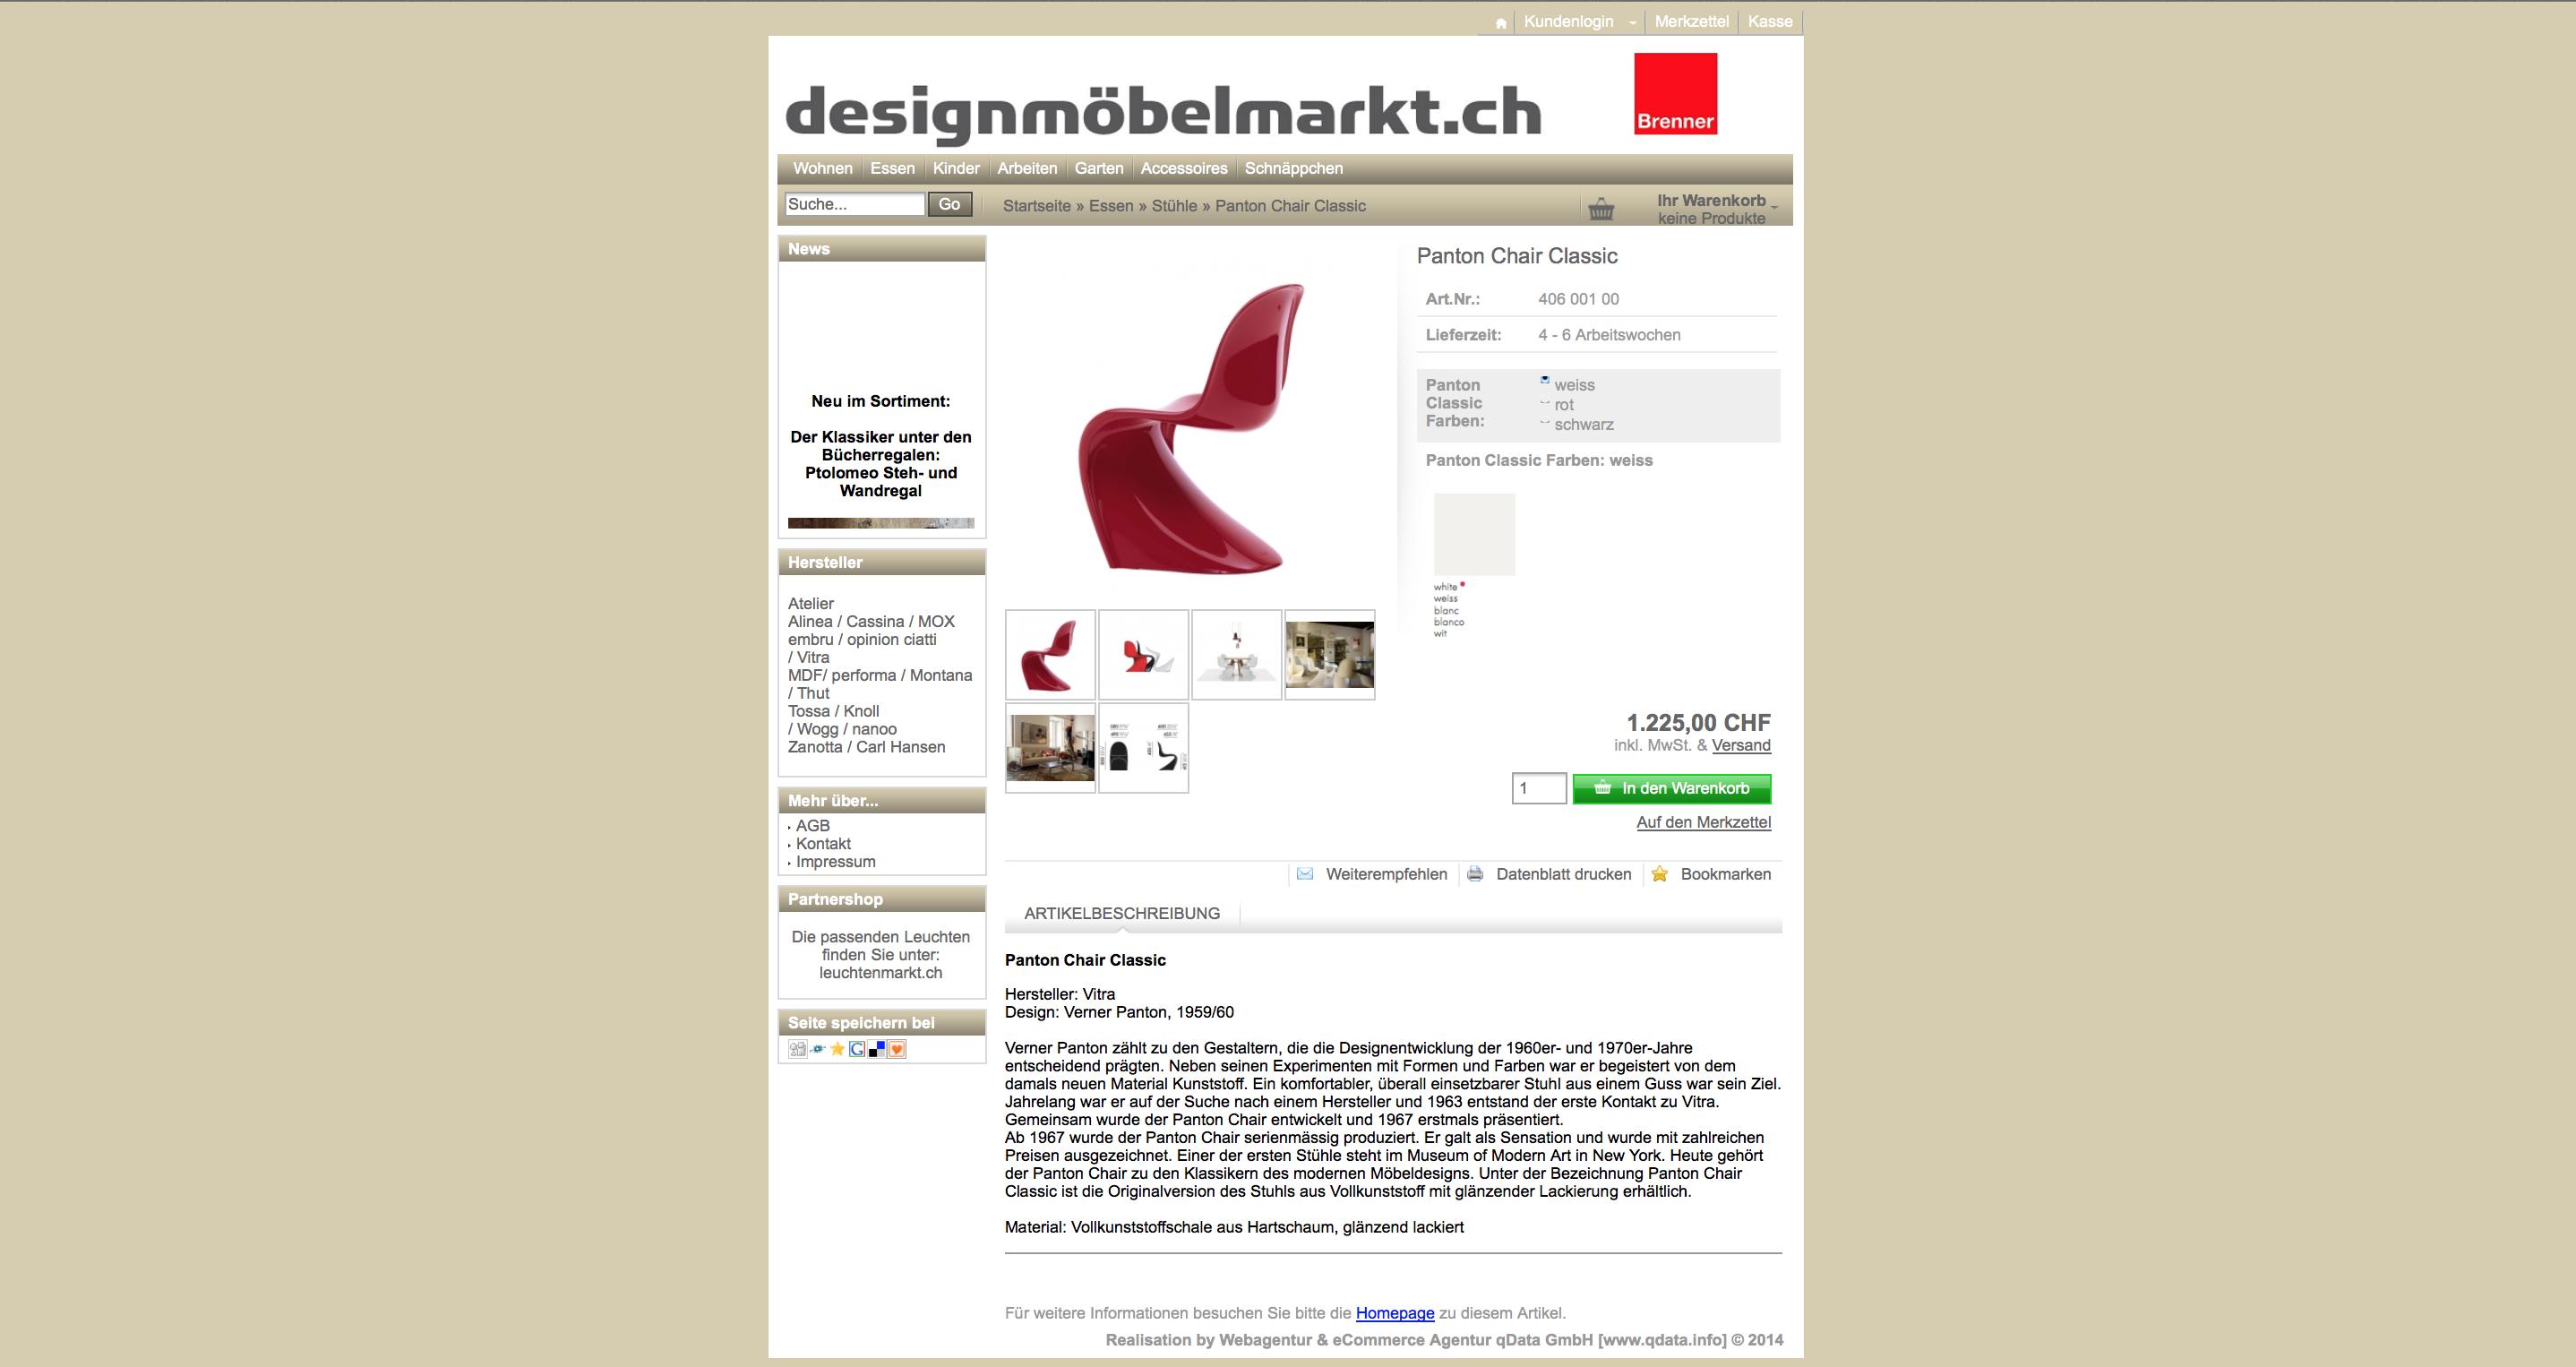 Designmoebelmarkt